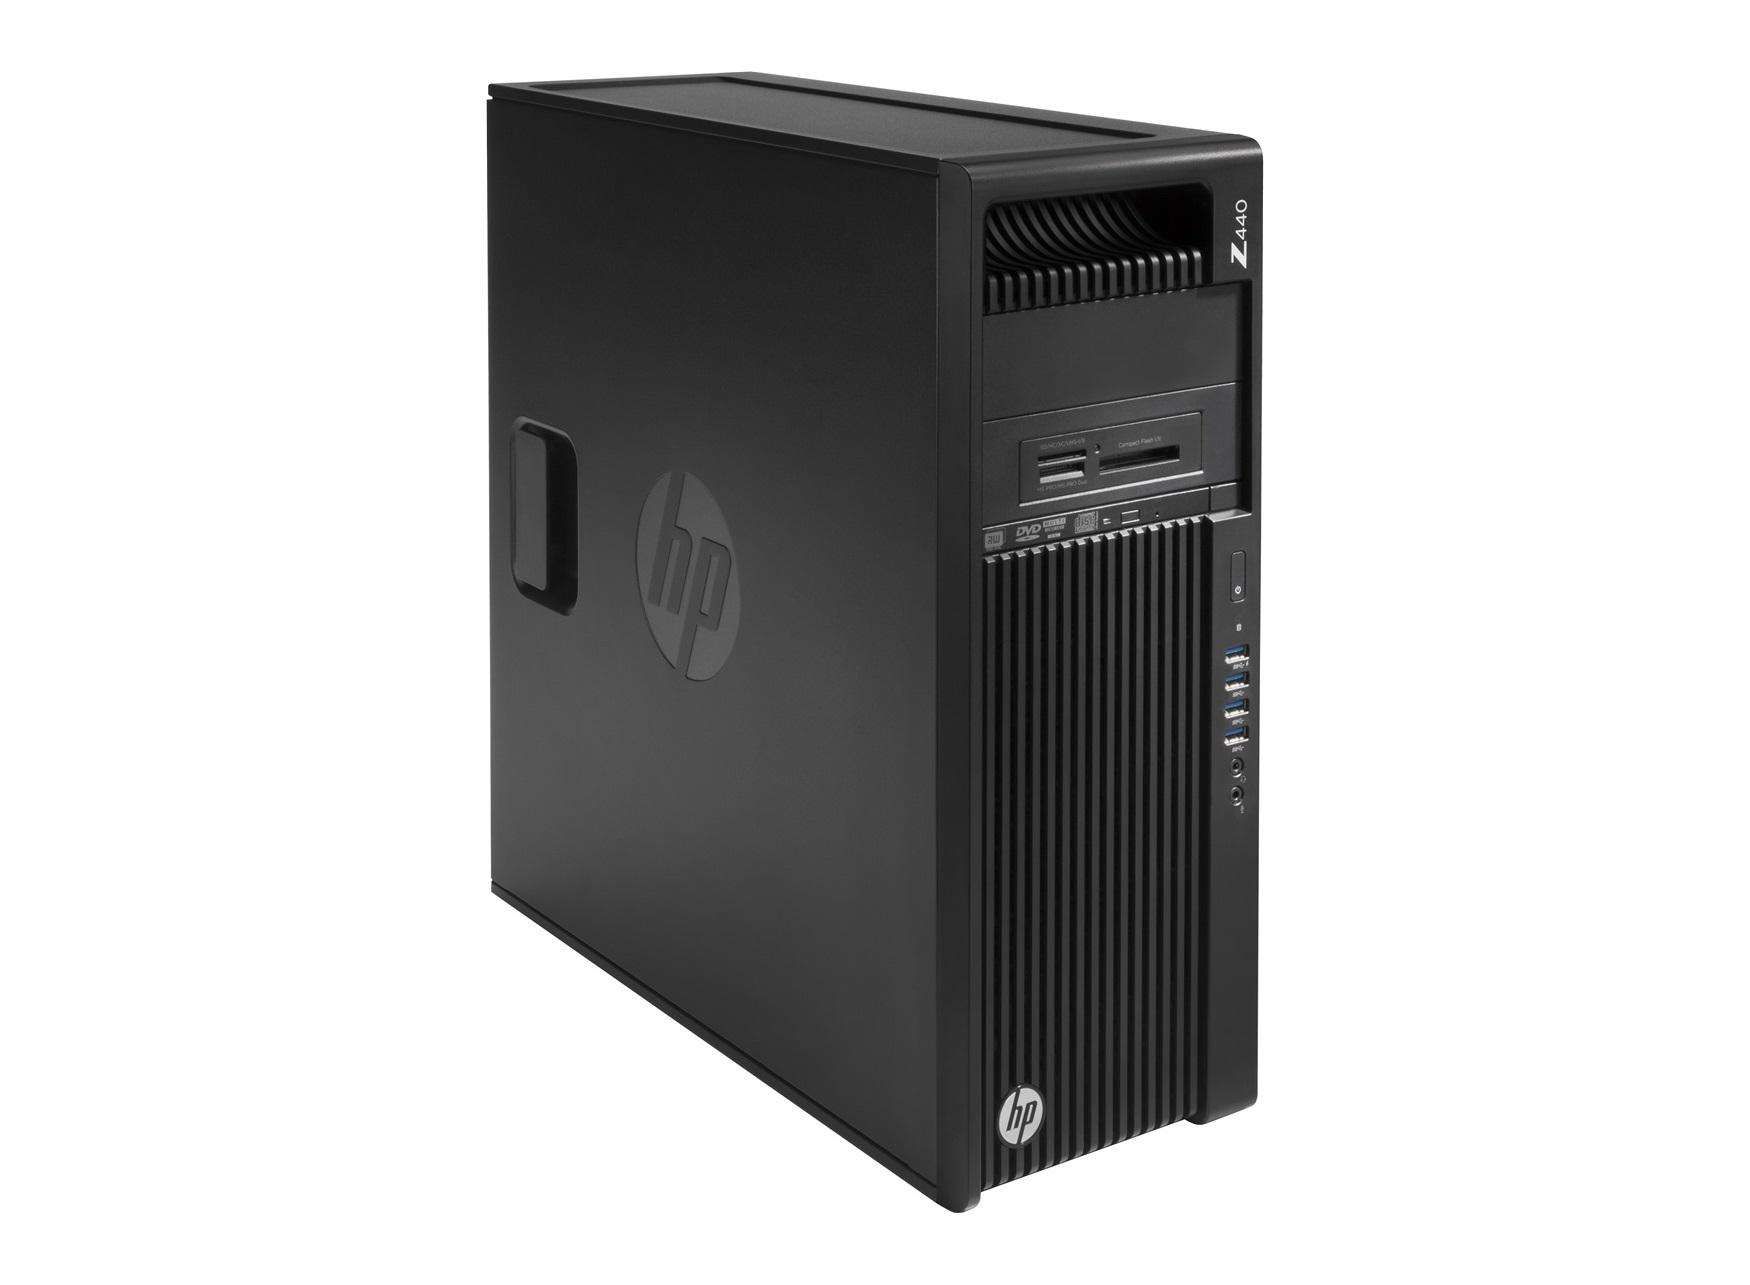 HP Z440 E5-1650v4 3.60GHz /16GB DDR4-2400 (2x8GB)/512GB SSD PCIe/Win 10 Pro